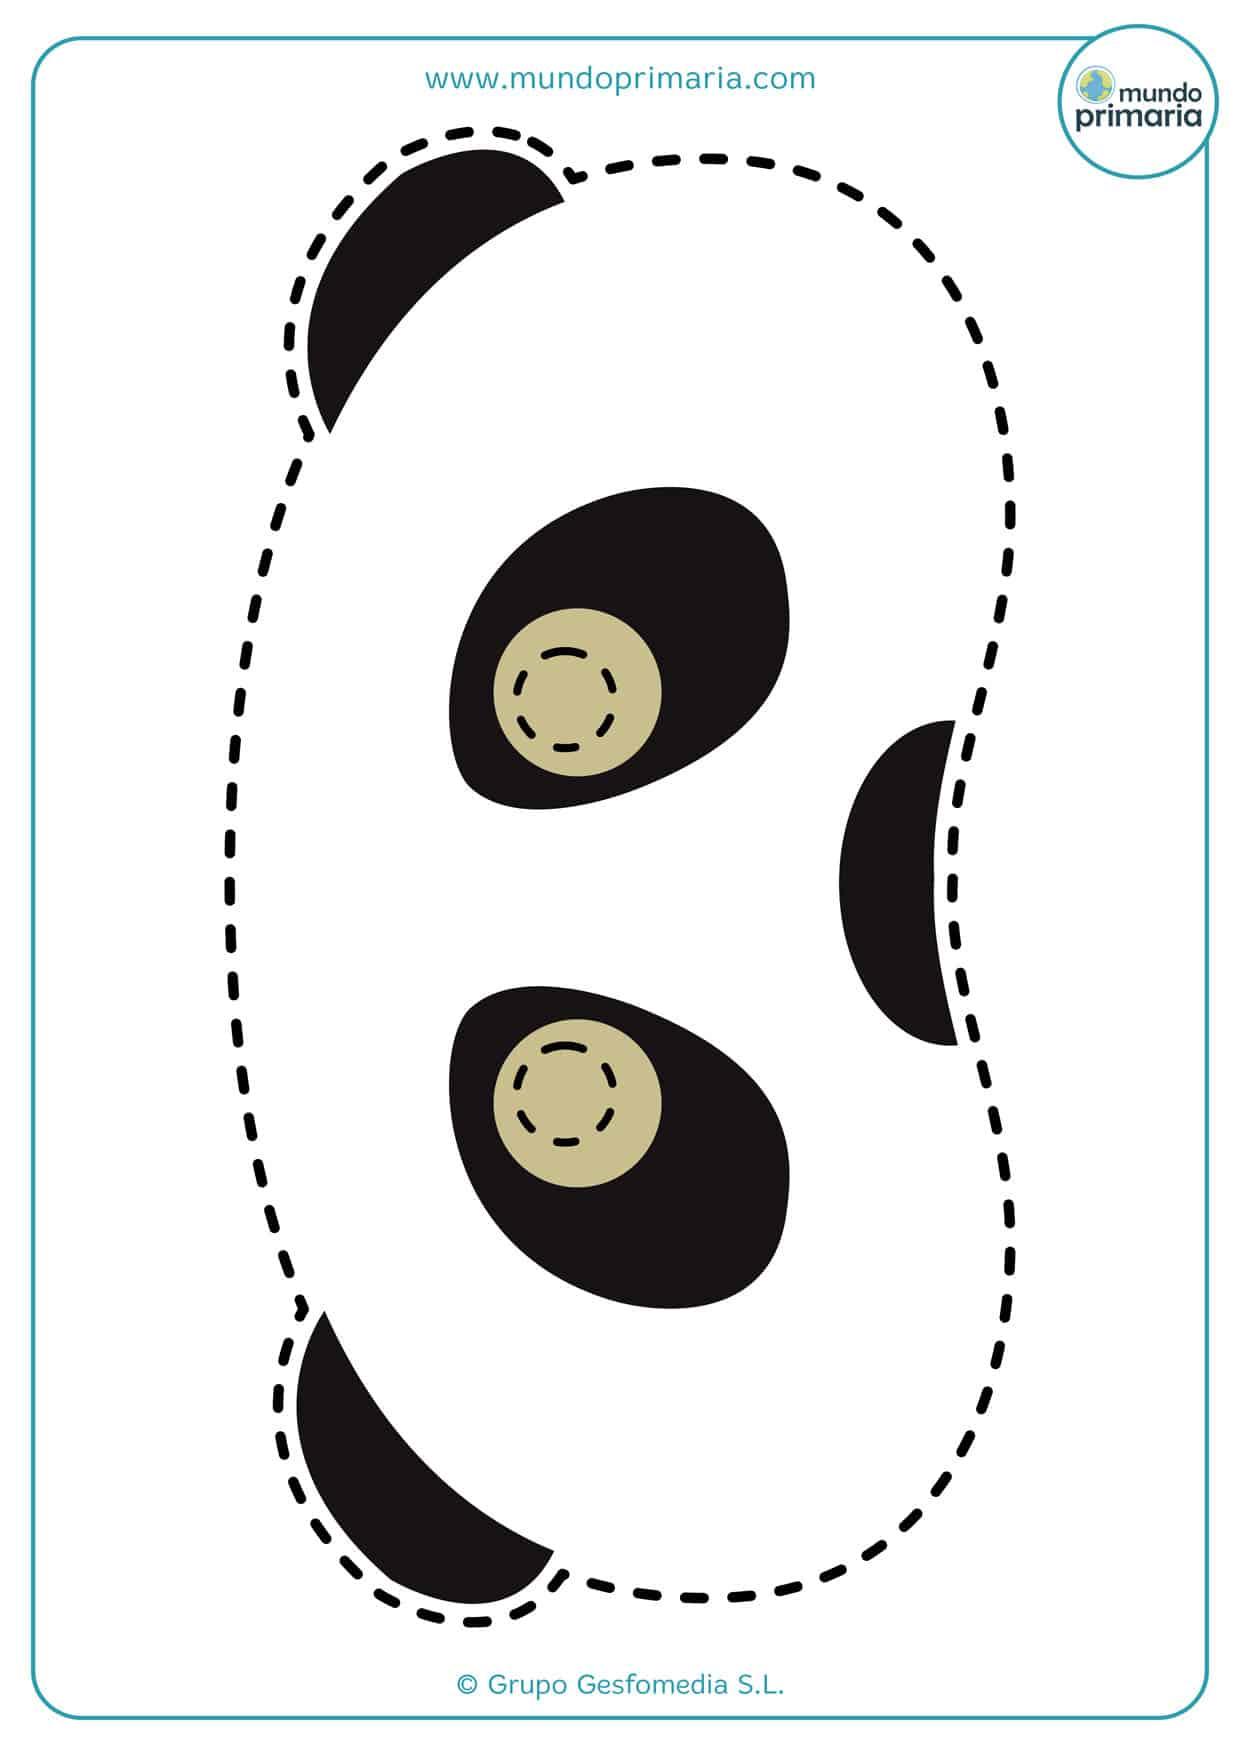 careta de oso panda para imprimir en papel o cartulina